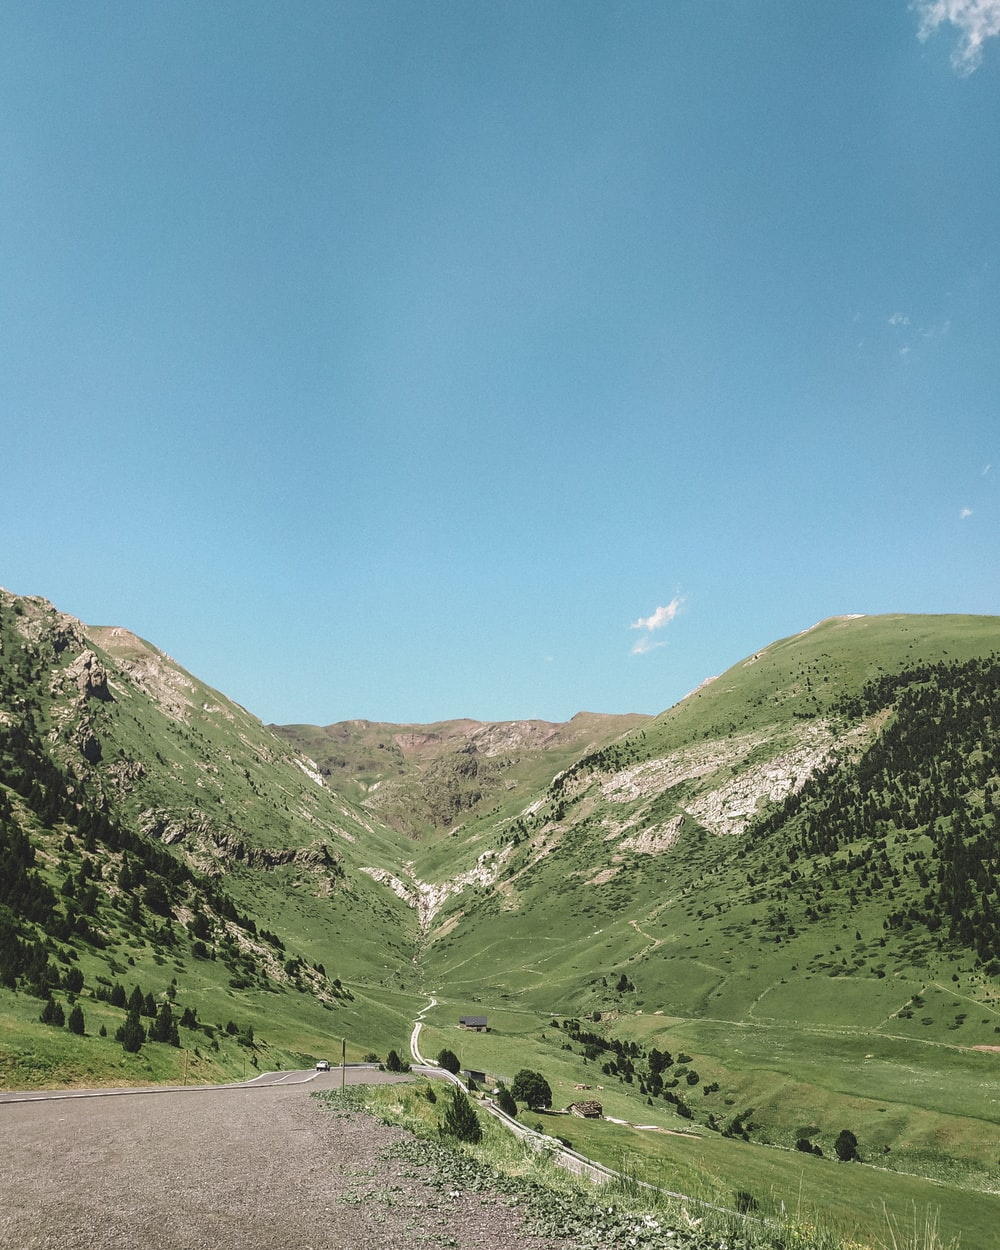 high angle photo of mountain